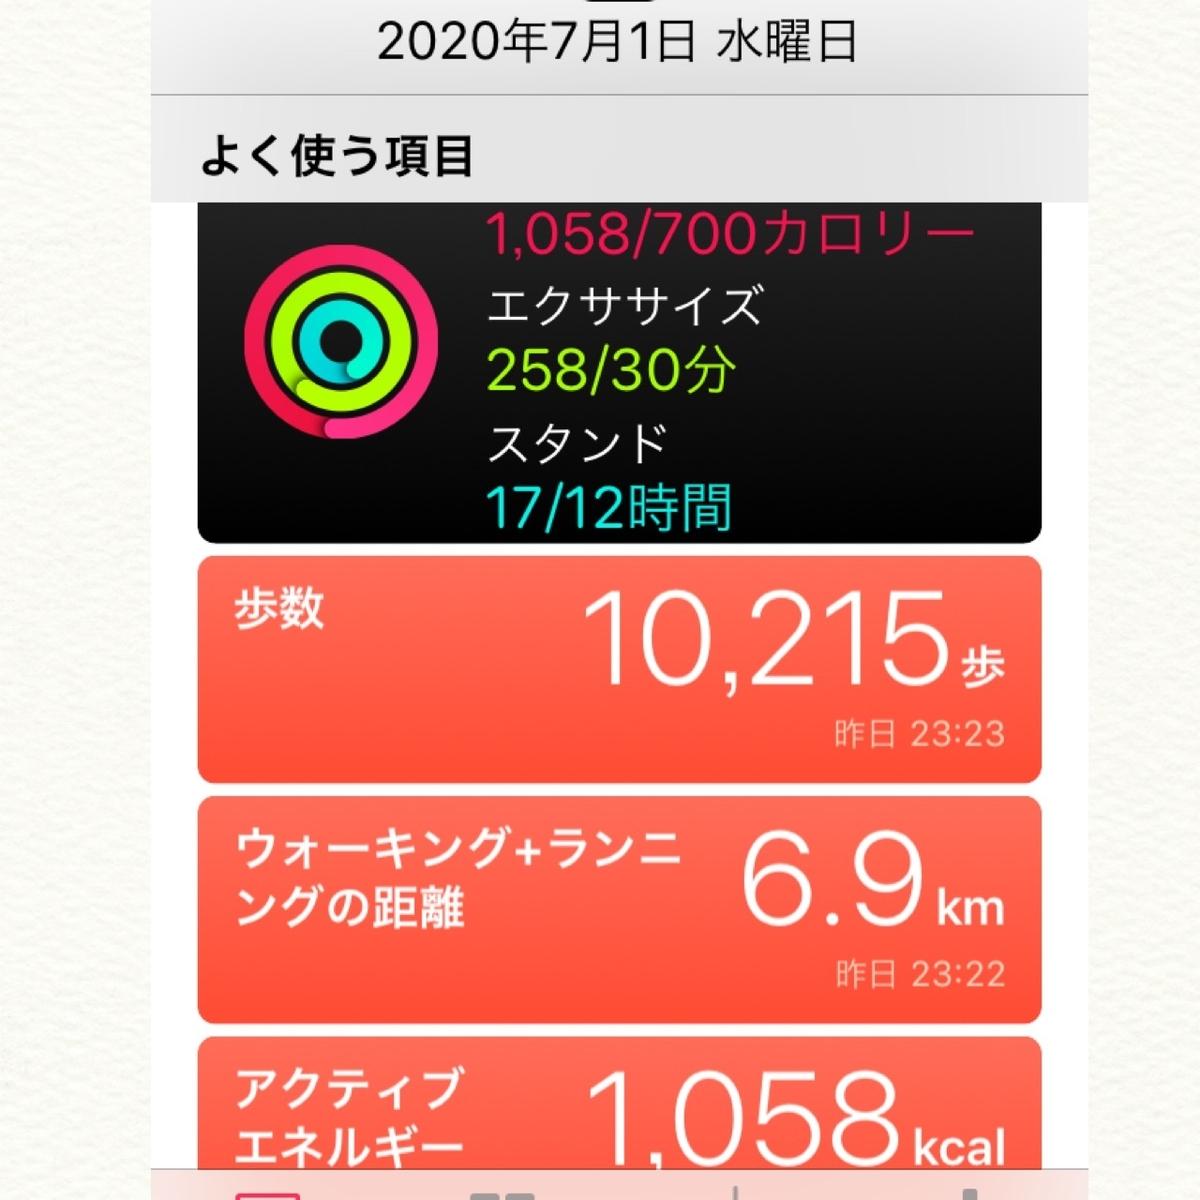 f:id:inoue-0218-yuko:20200702142805j:plain